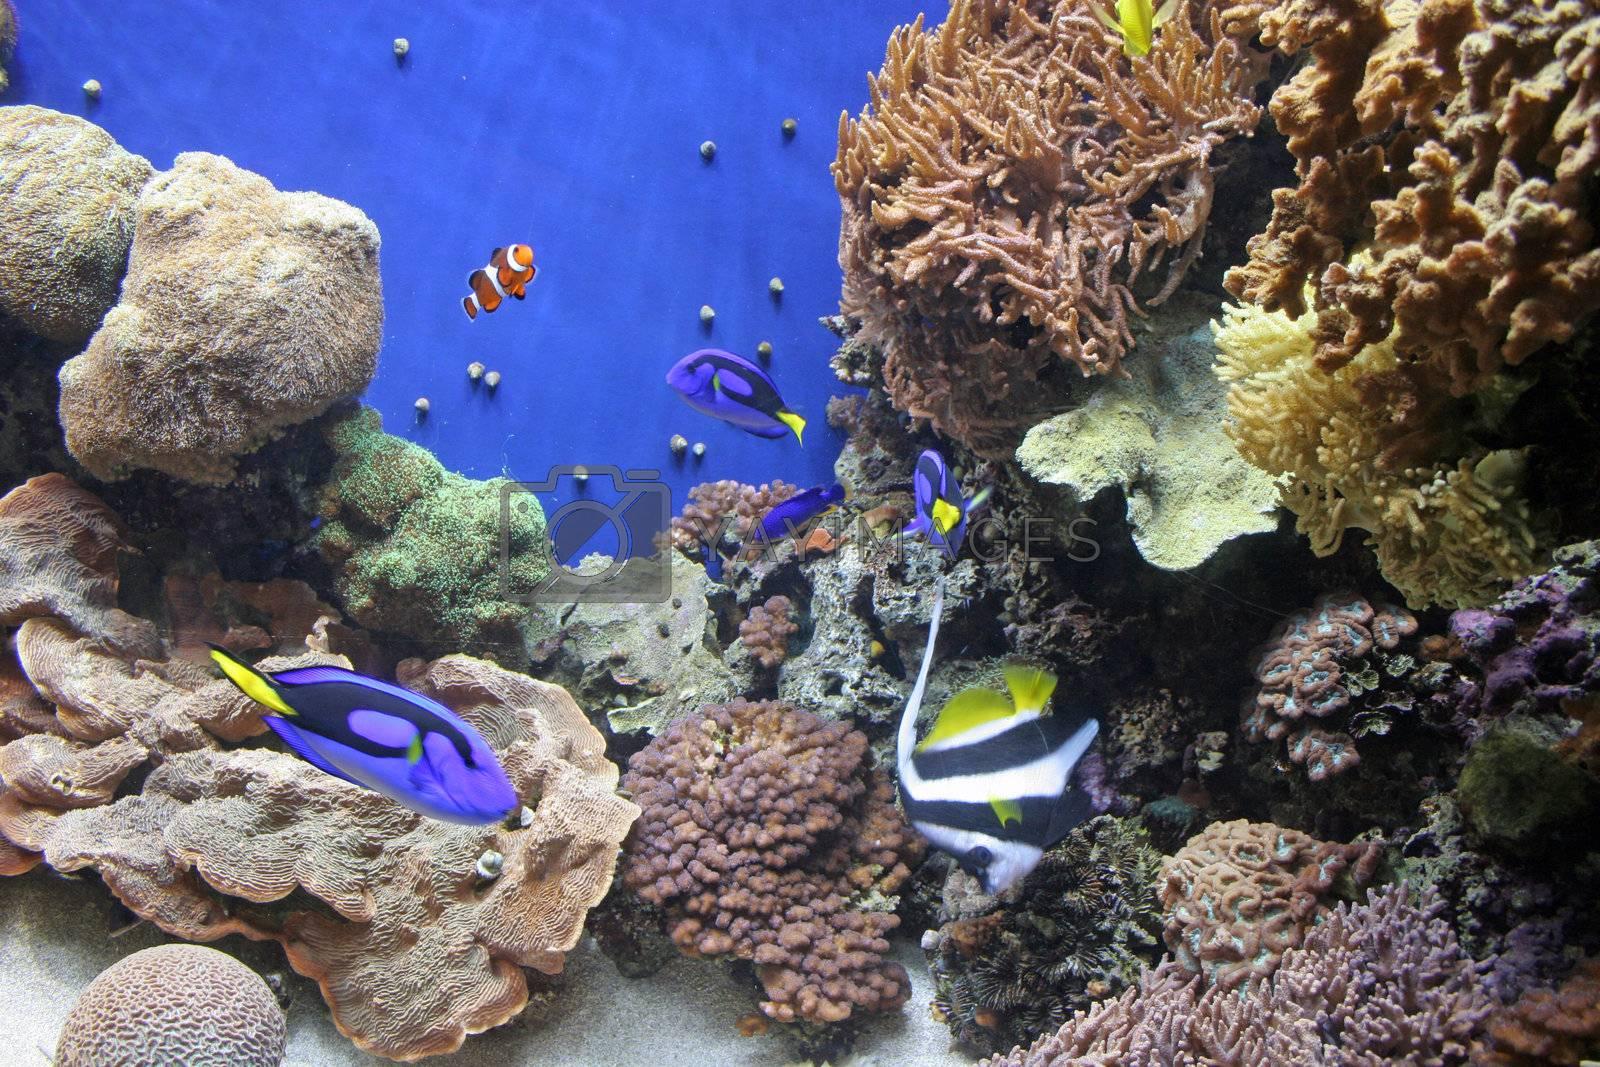 Aquarium 9 by dbvirago